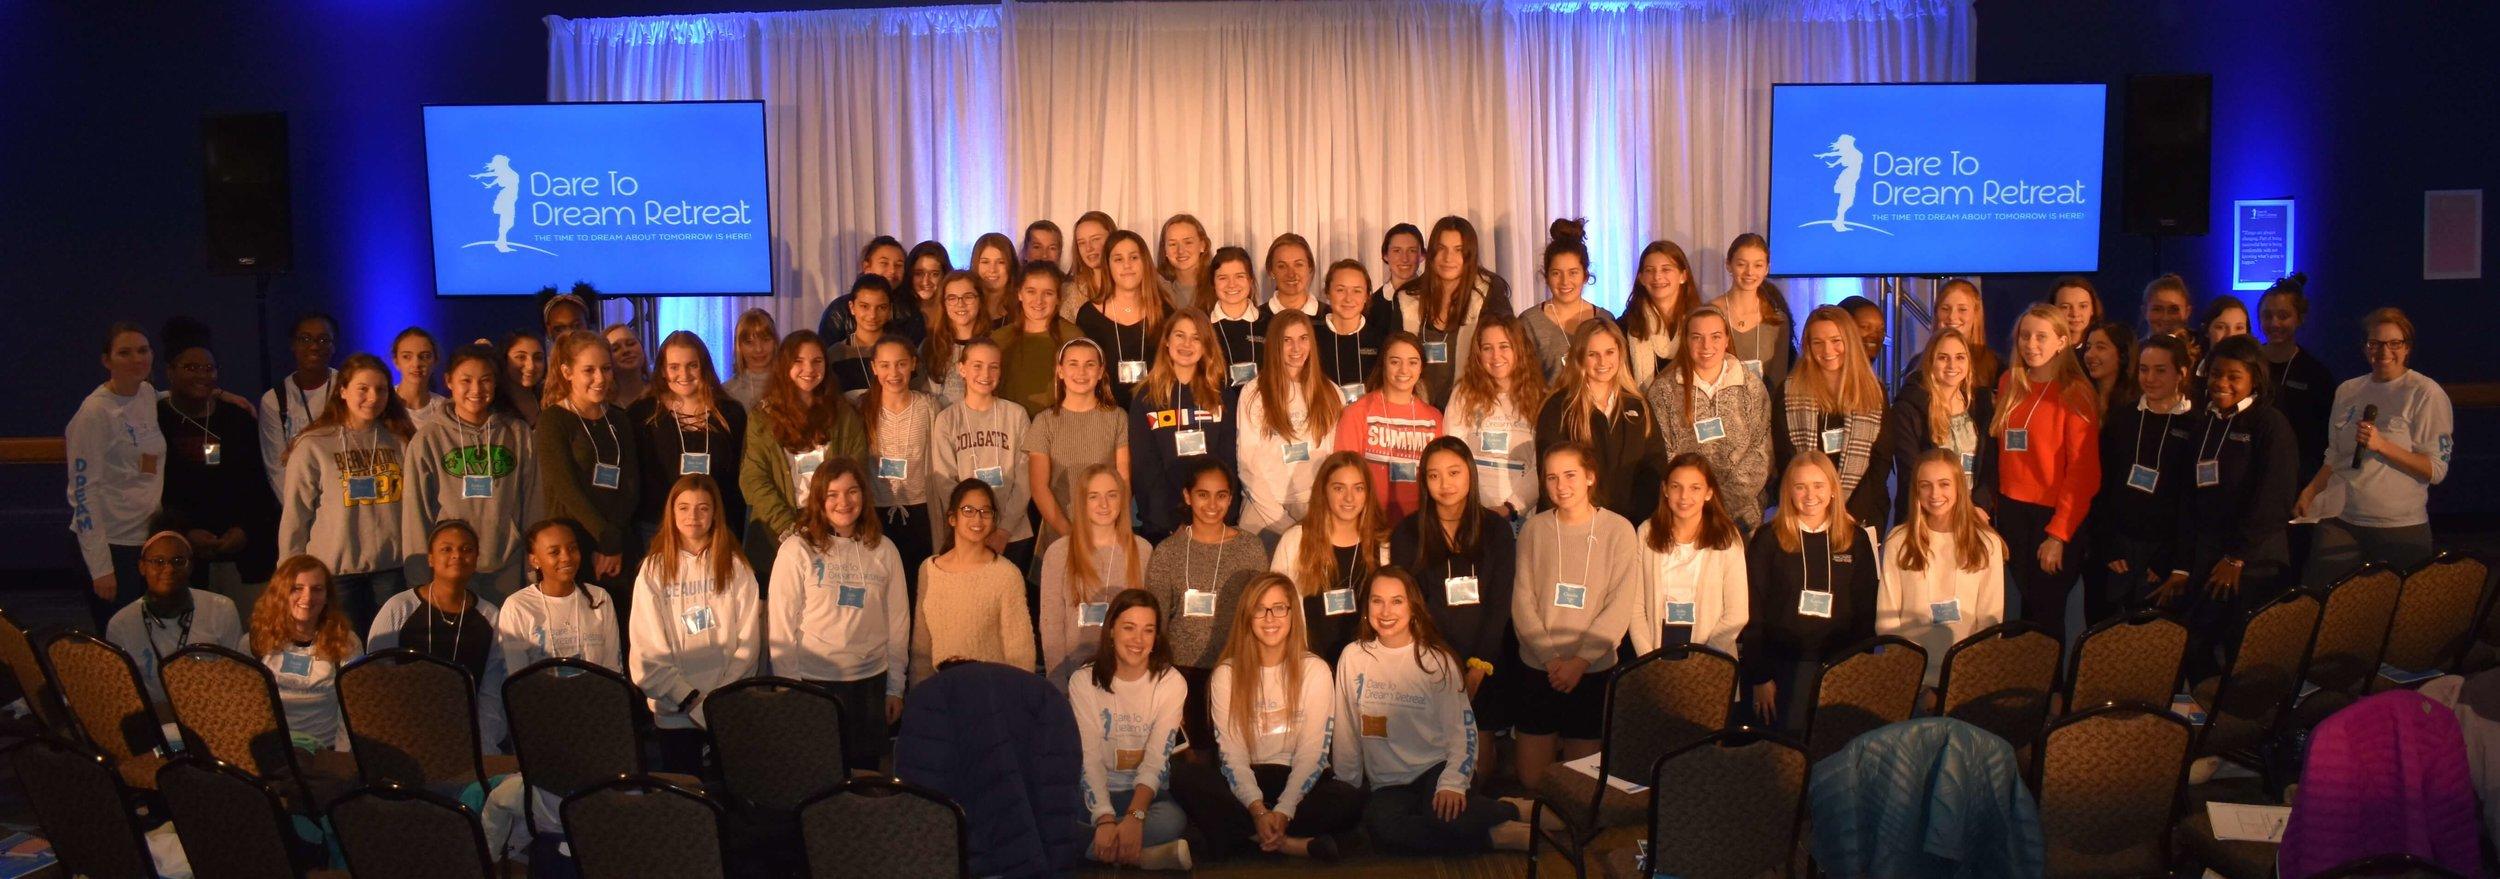 Group Photo (1) (1).jpg